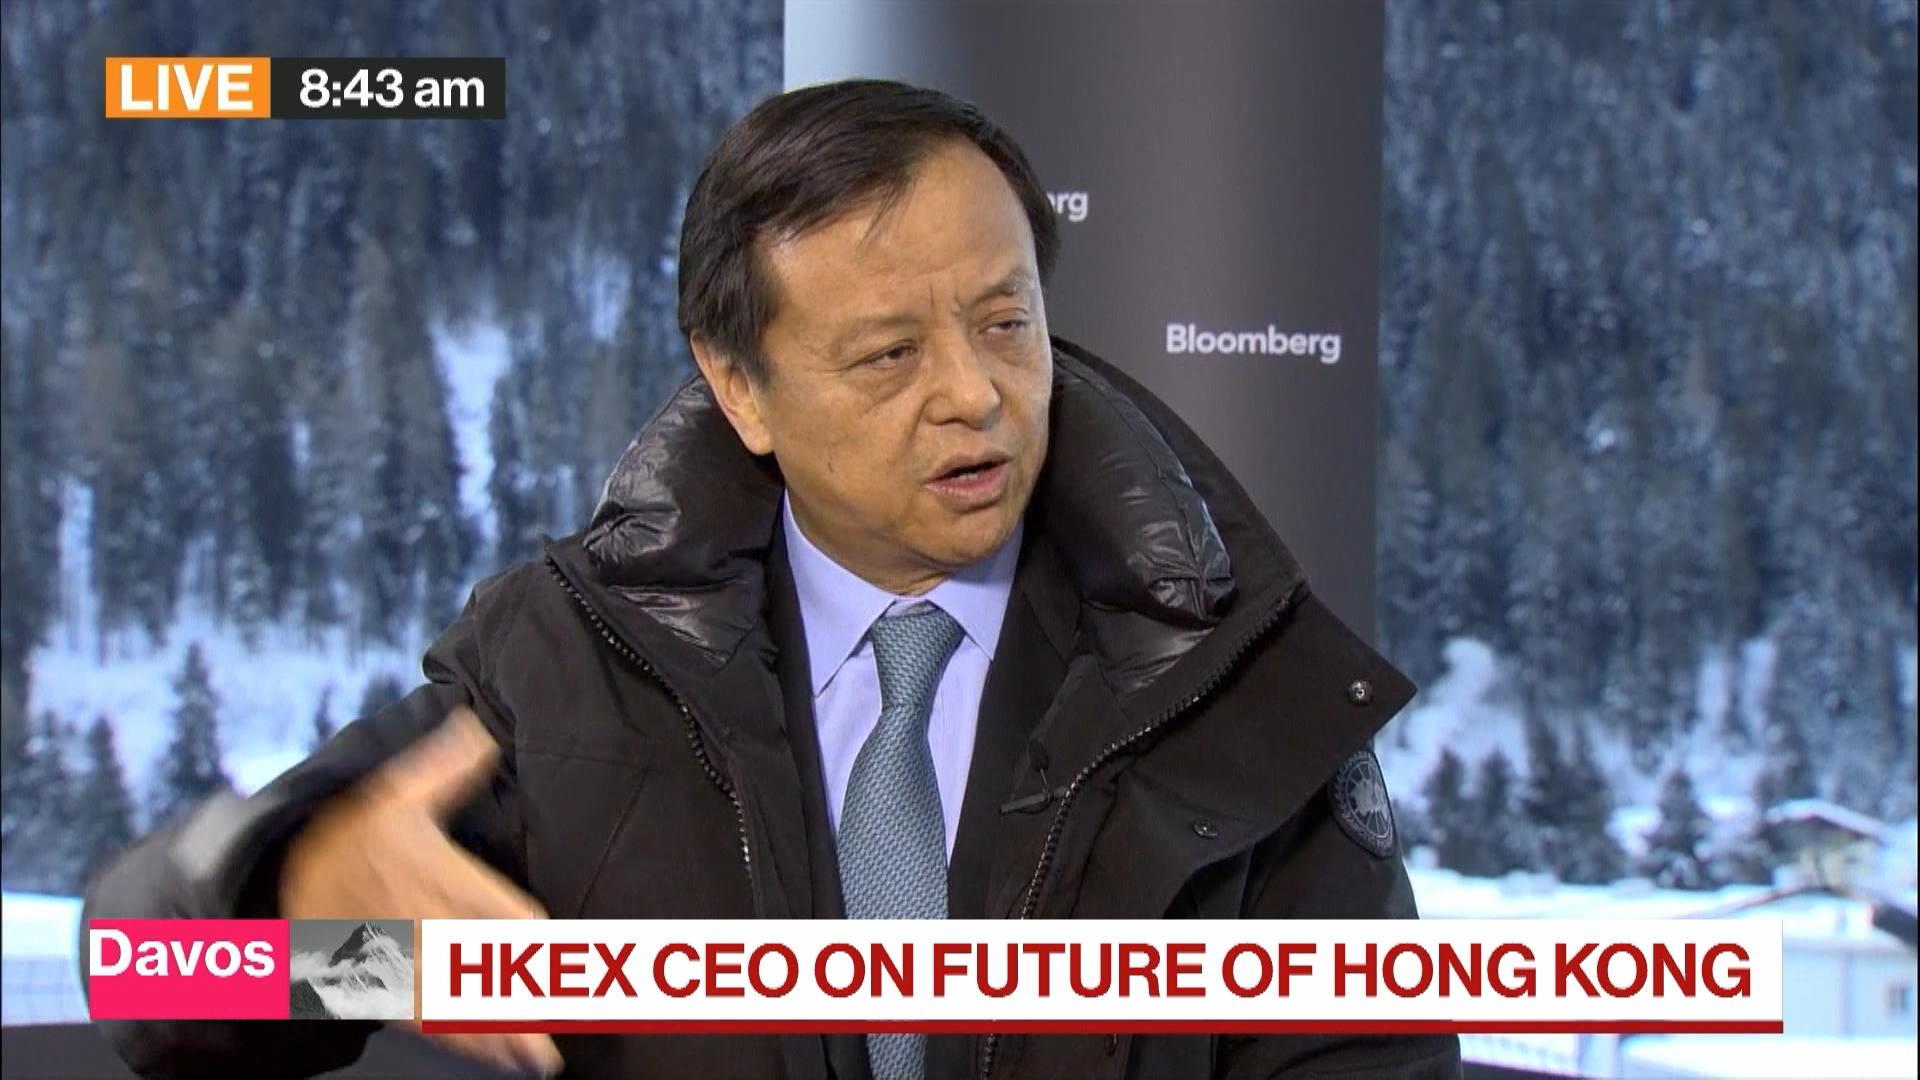 Davos: HKEX CEO 'Not Terribly Surprised' by Moody's Hong Kong Downgrade